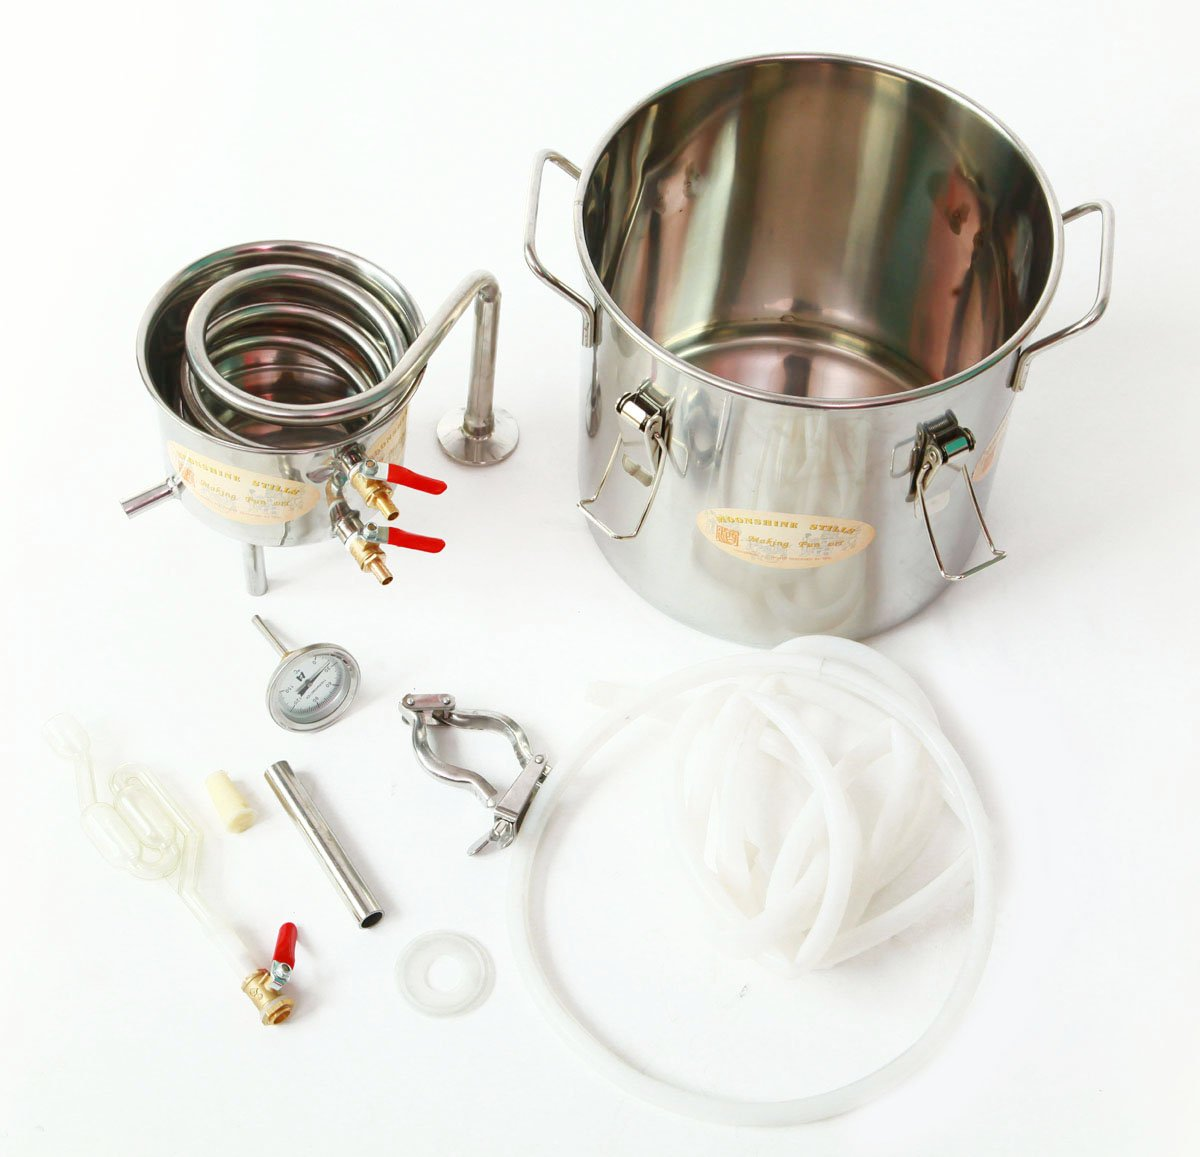 DIY 2 Gal 10 Liters Home Alcohol Whiskey Distiller Moonshine Still Stainless Steel Boiler Wine Making Kit by WMN_TRULYSTEP (Image #9)